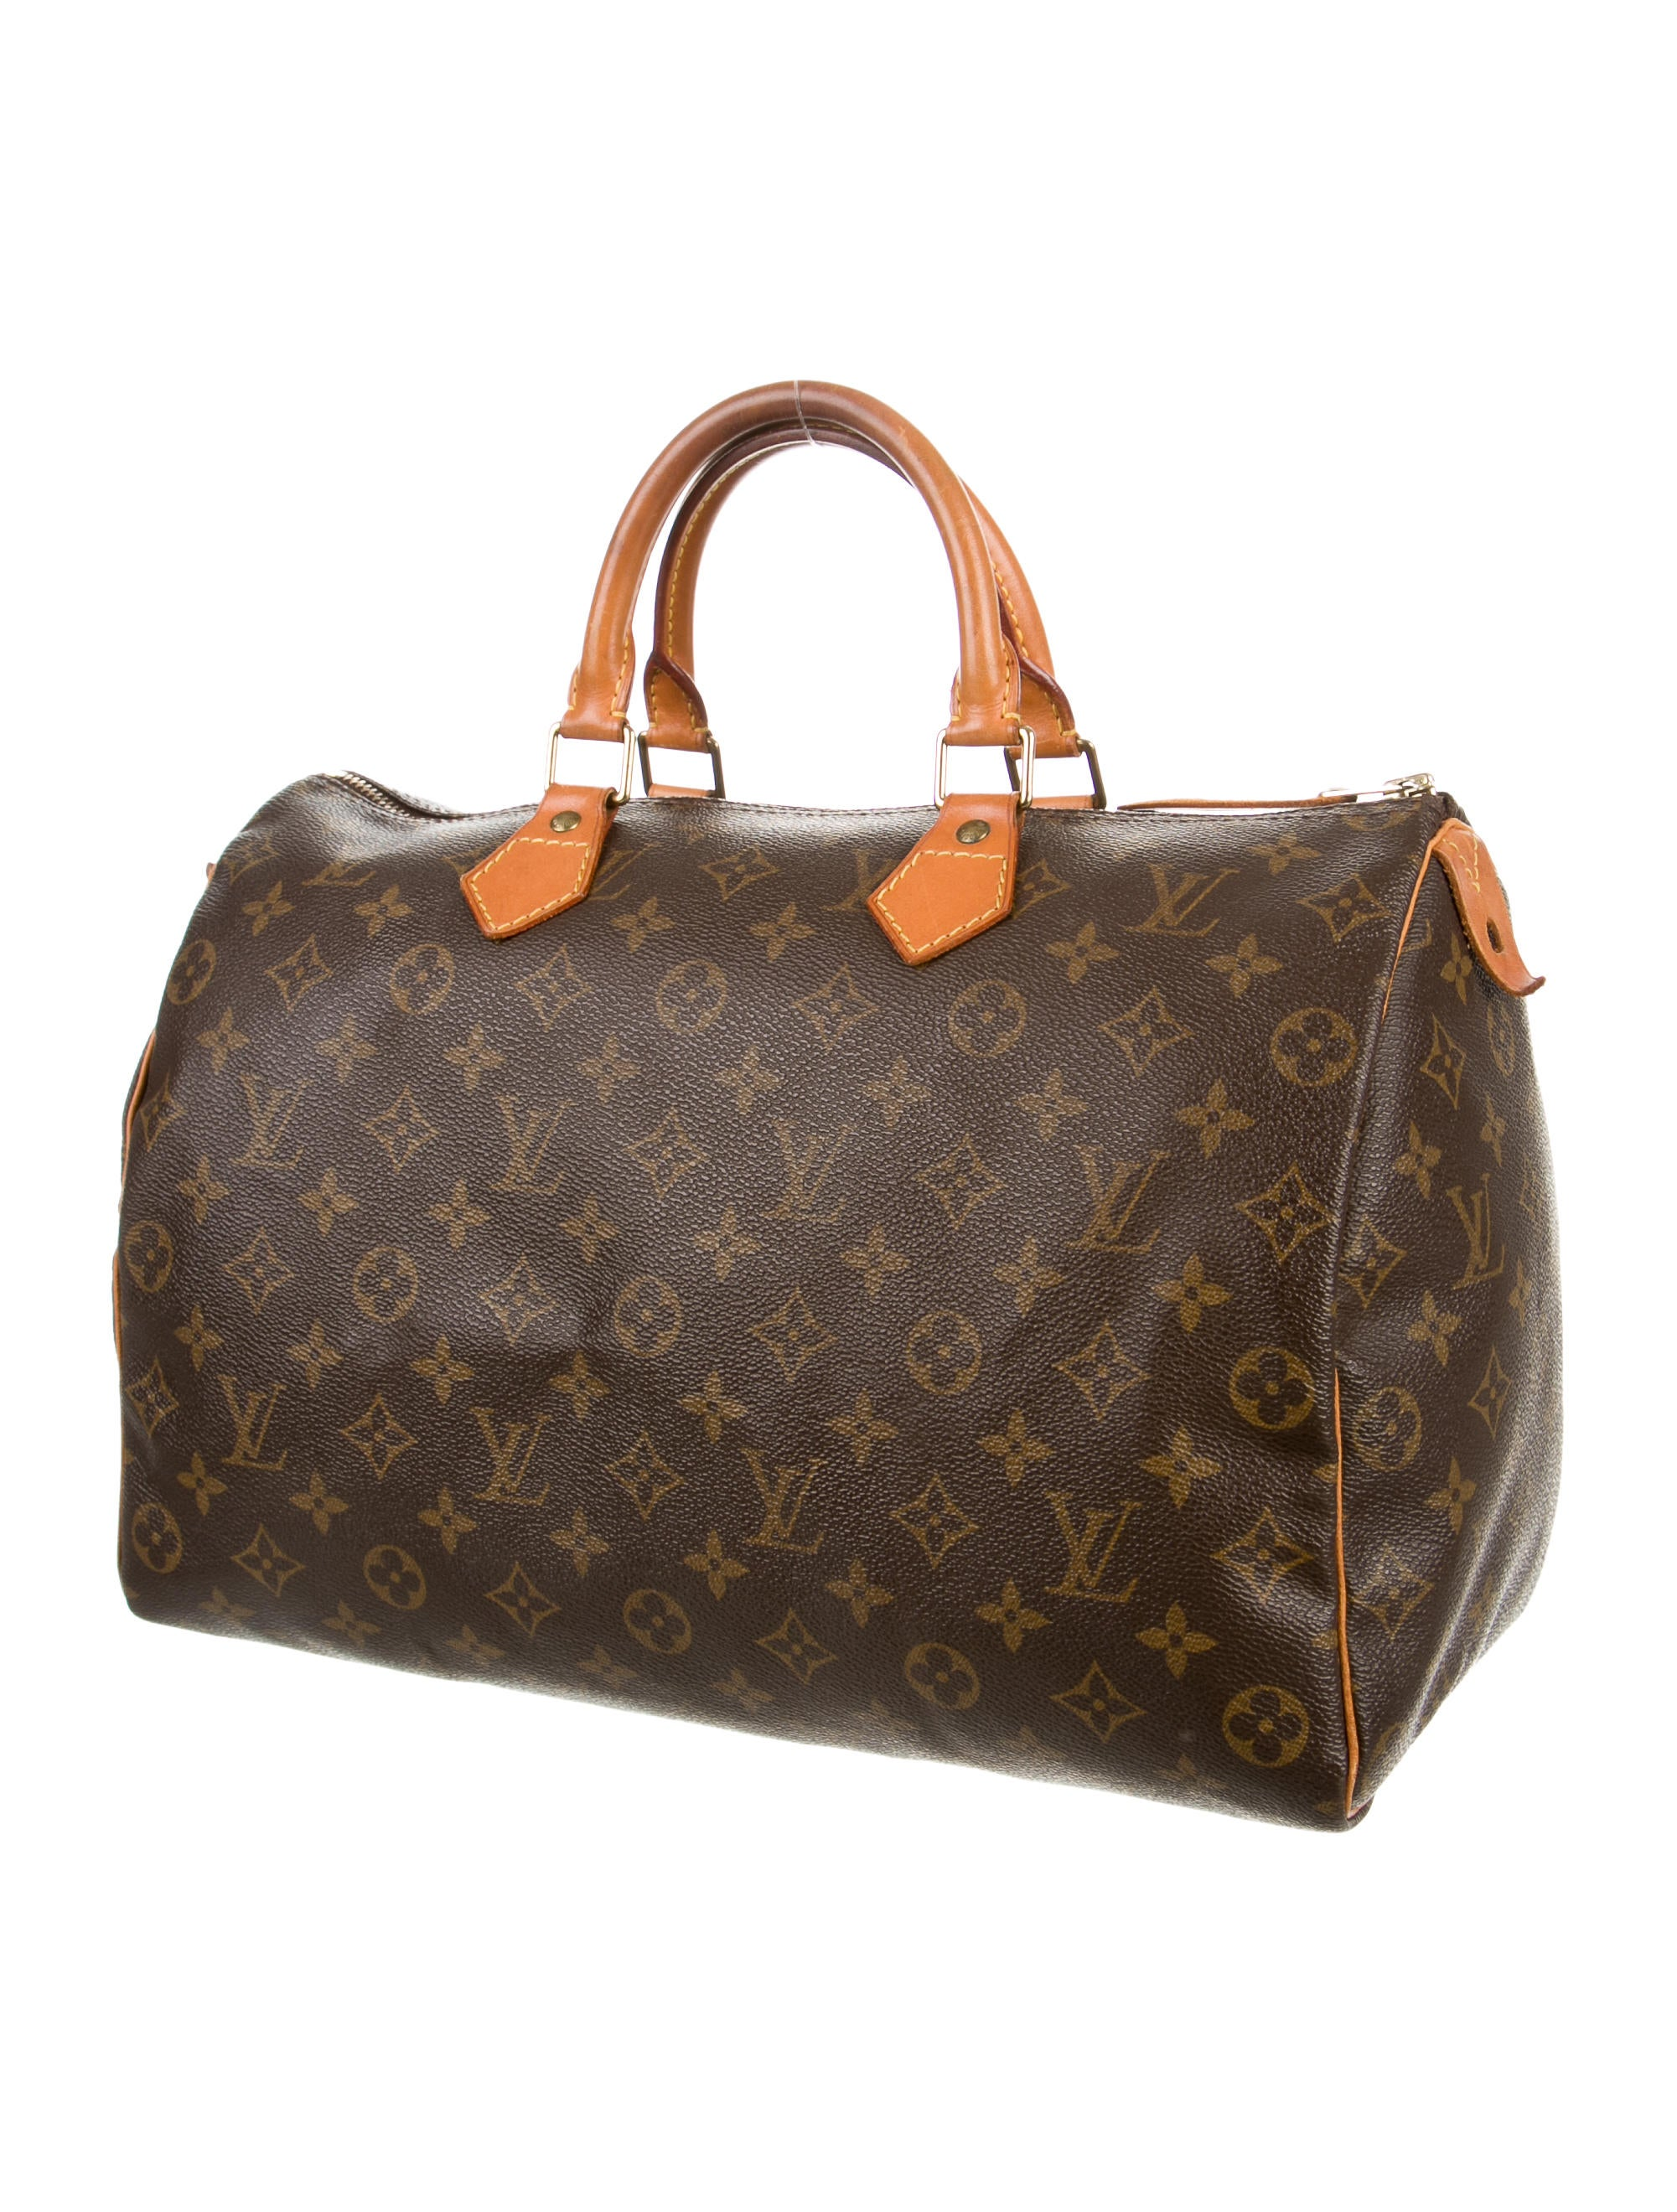 louis vuitton monogram speedy 35 handbags lou83065. Black Bedroom Furniture Sets. Home Design Ideas